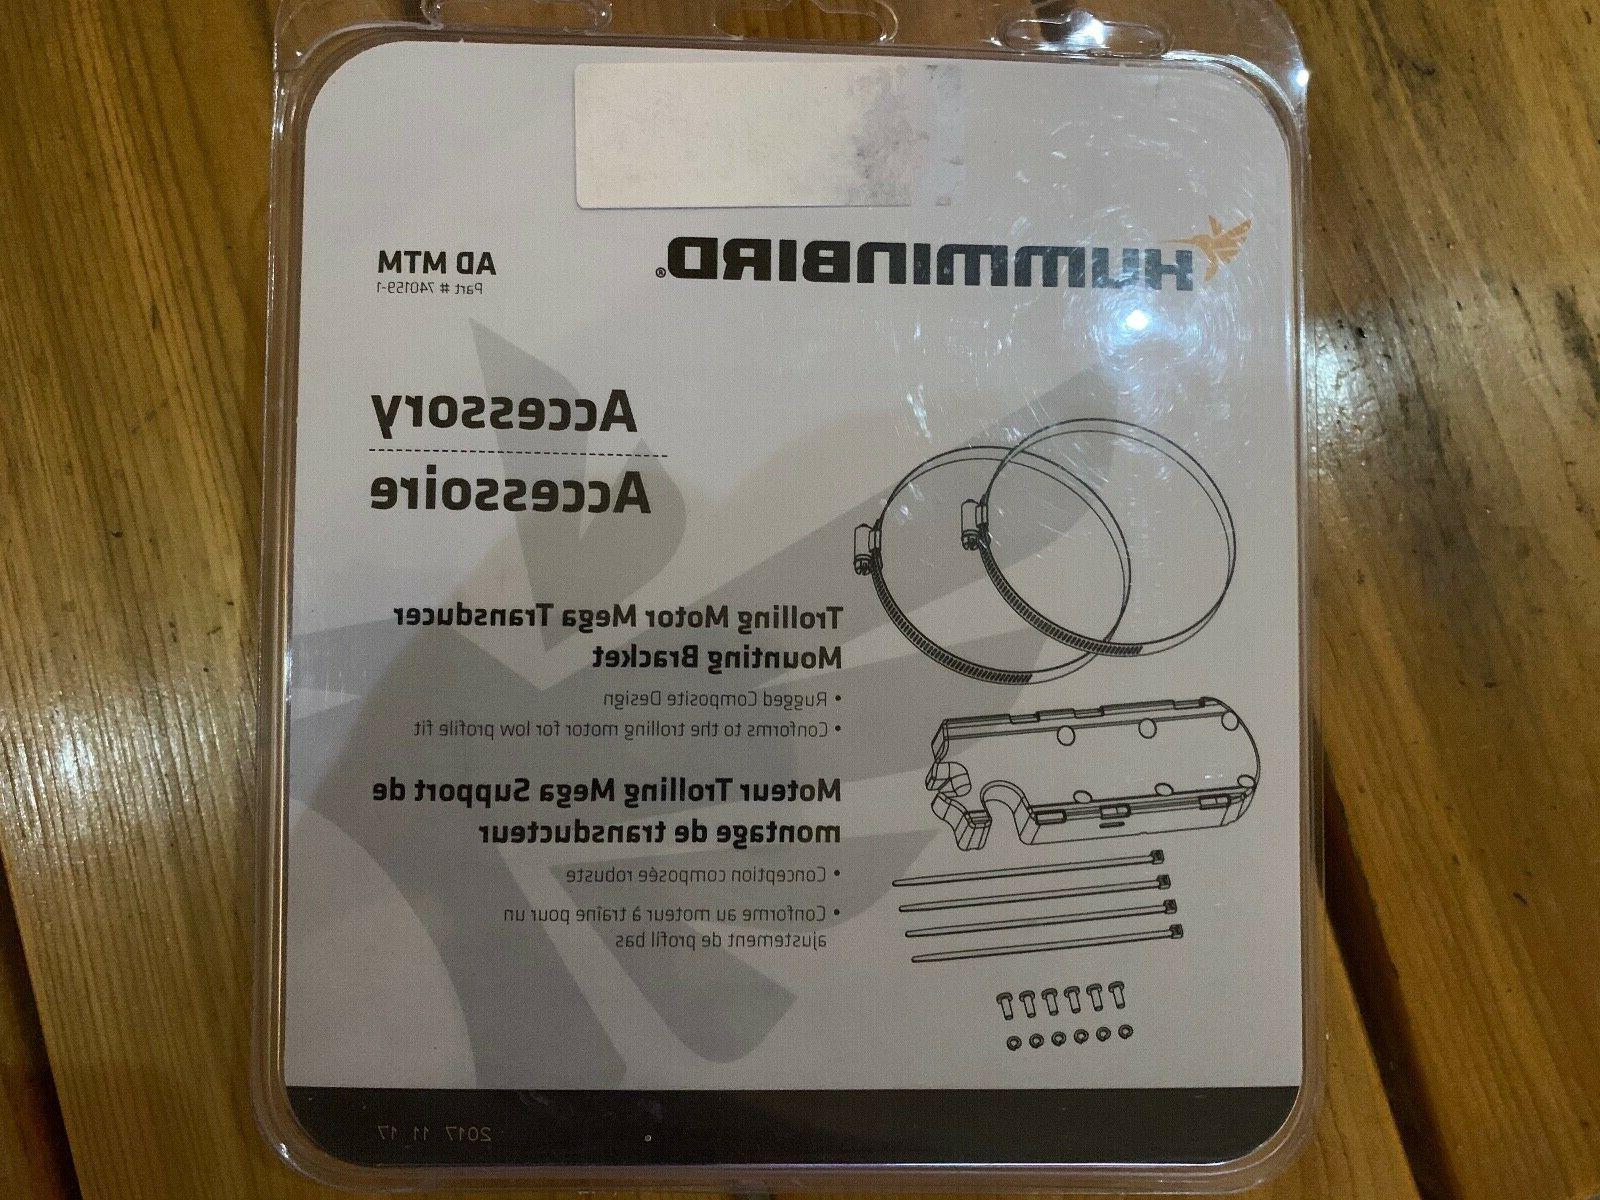 trolling motor adapters ad mtm